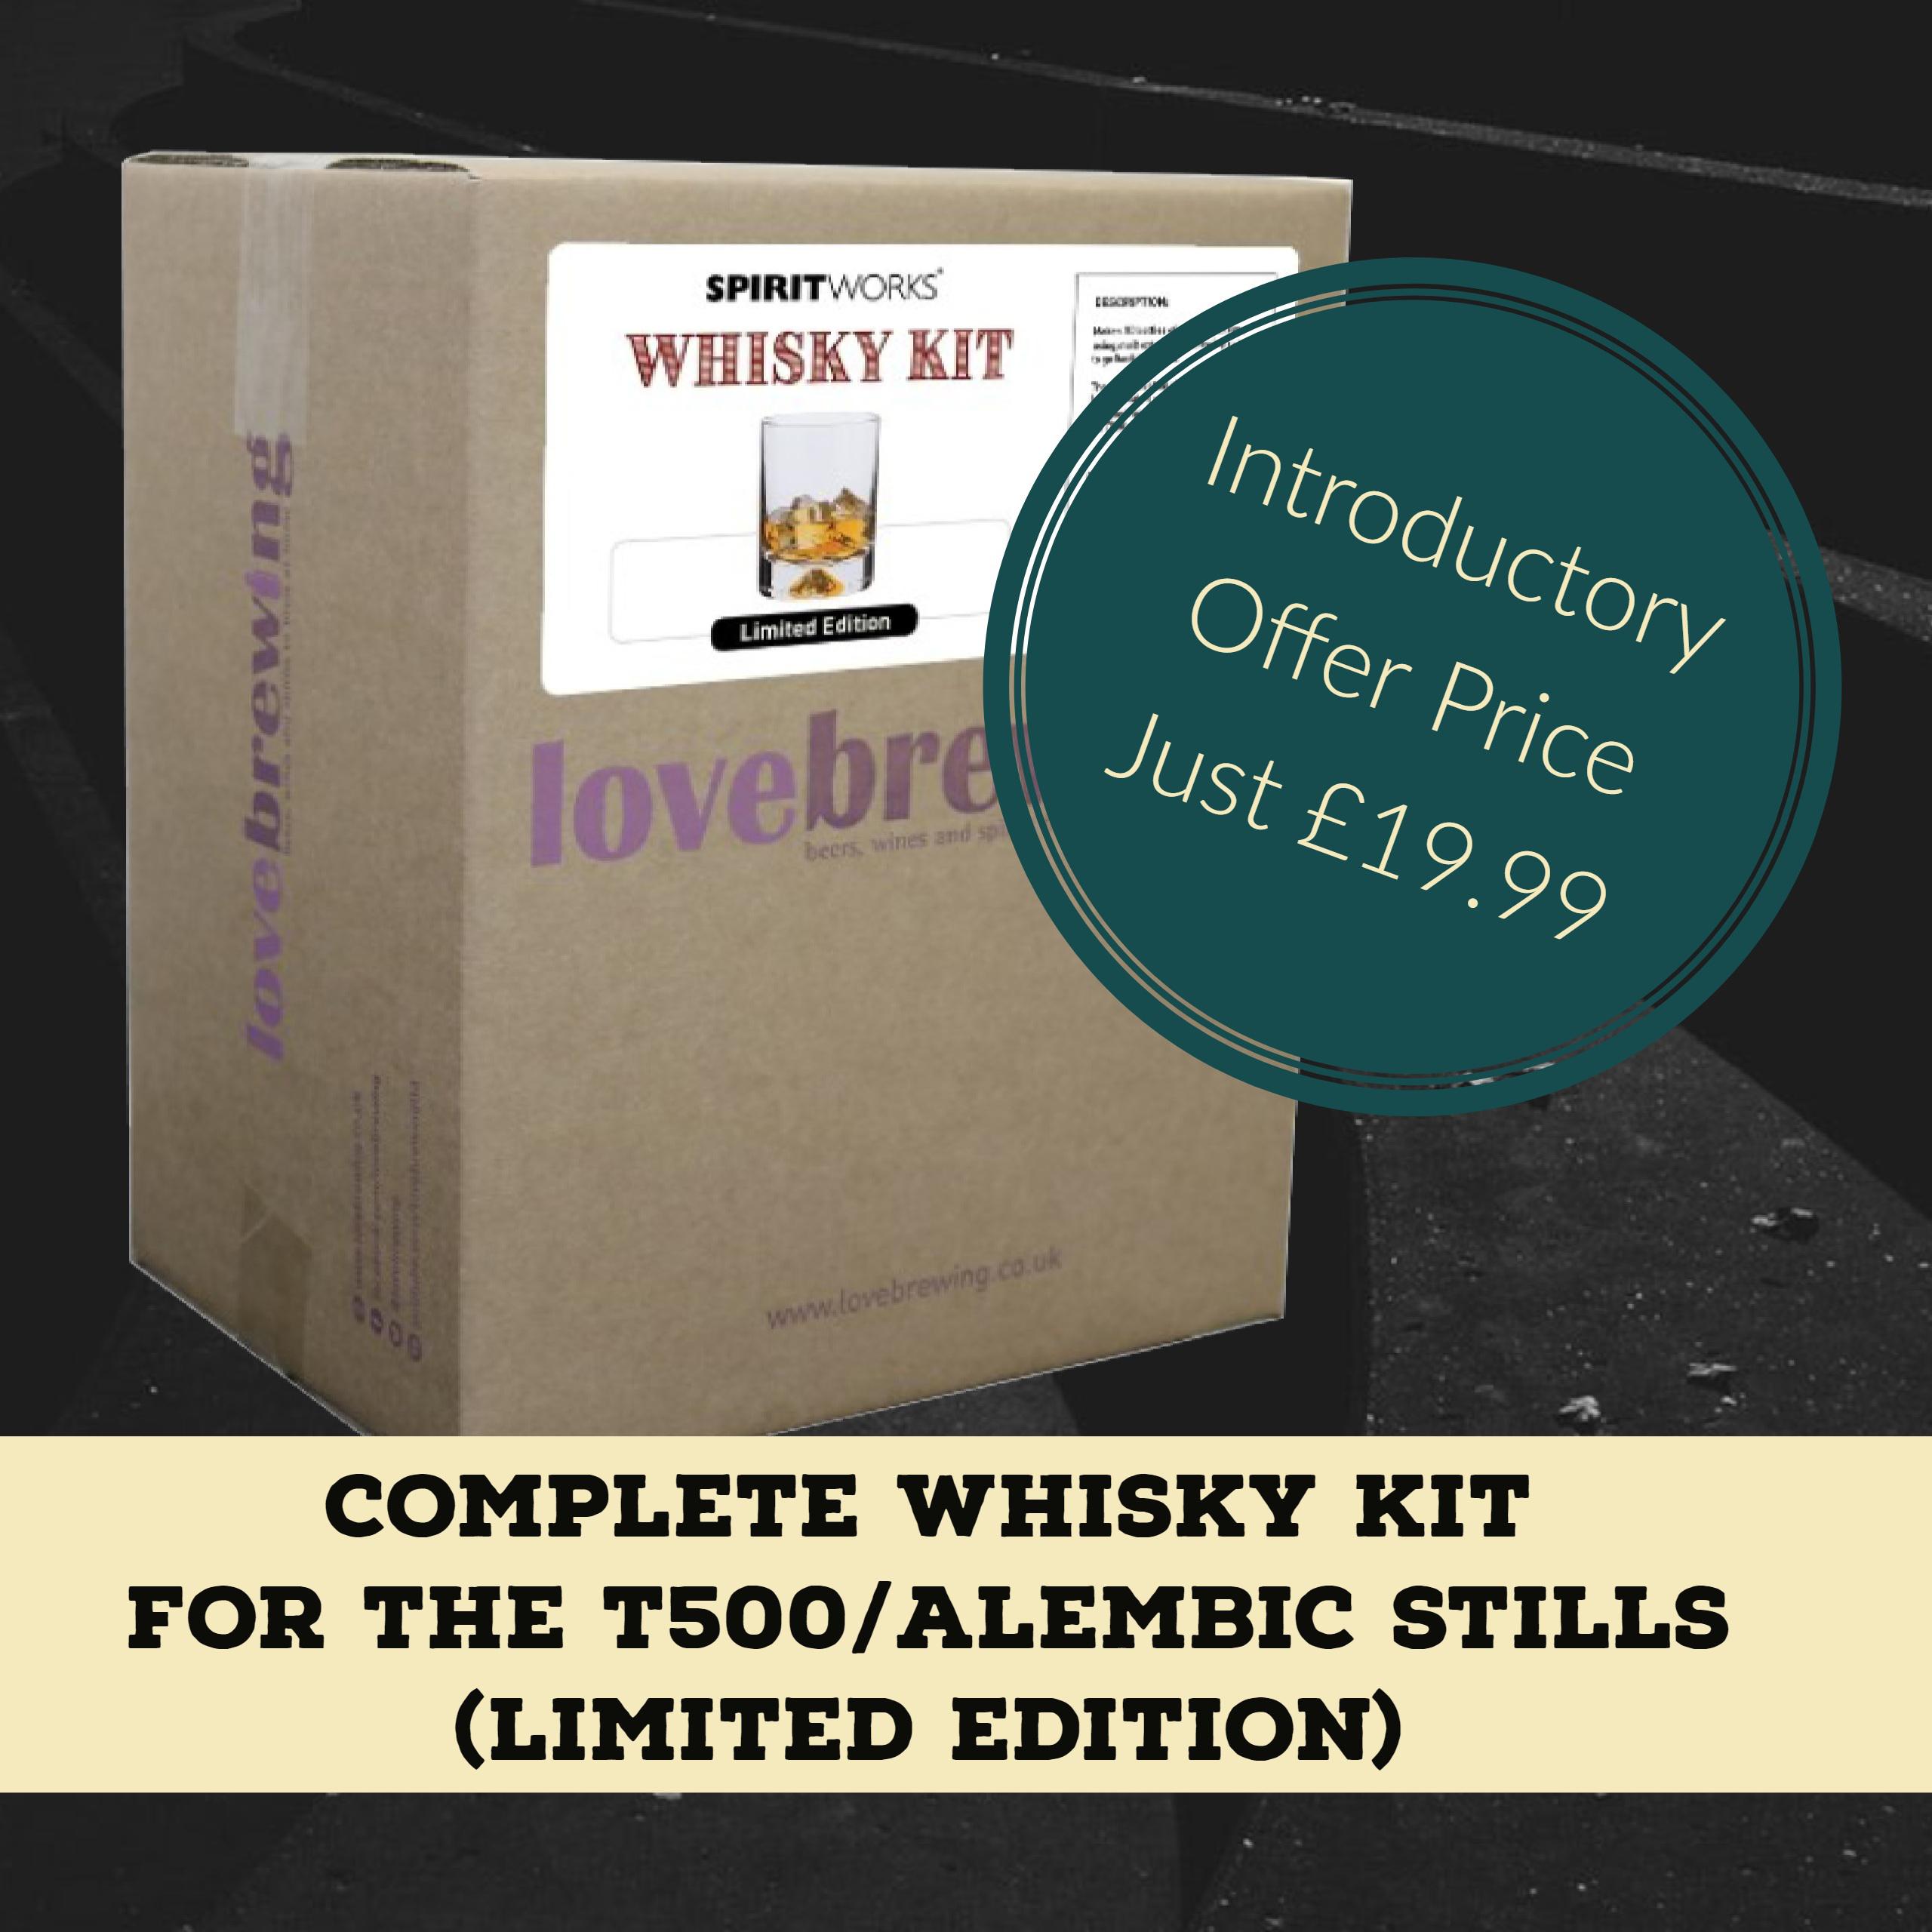 Complete-Whisky-Kit